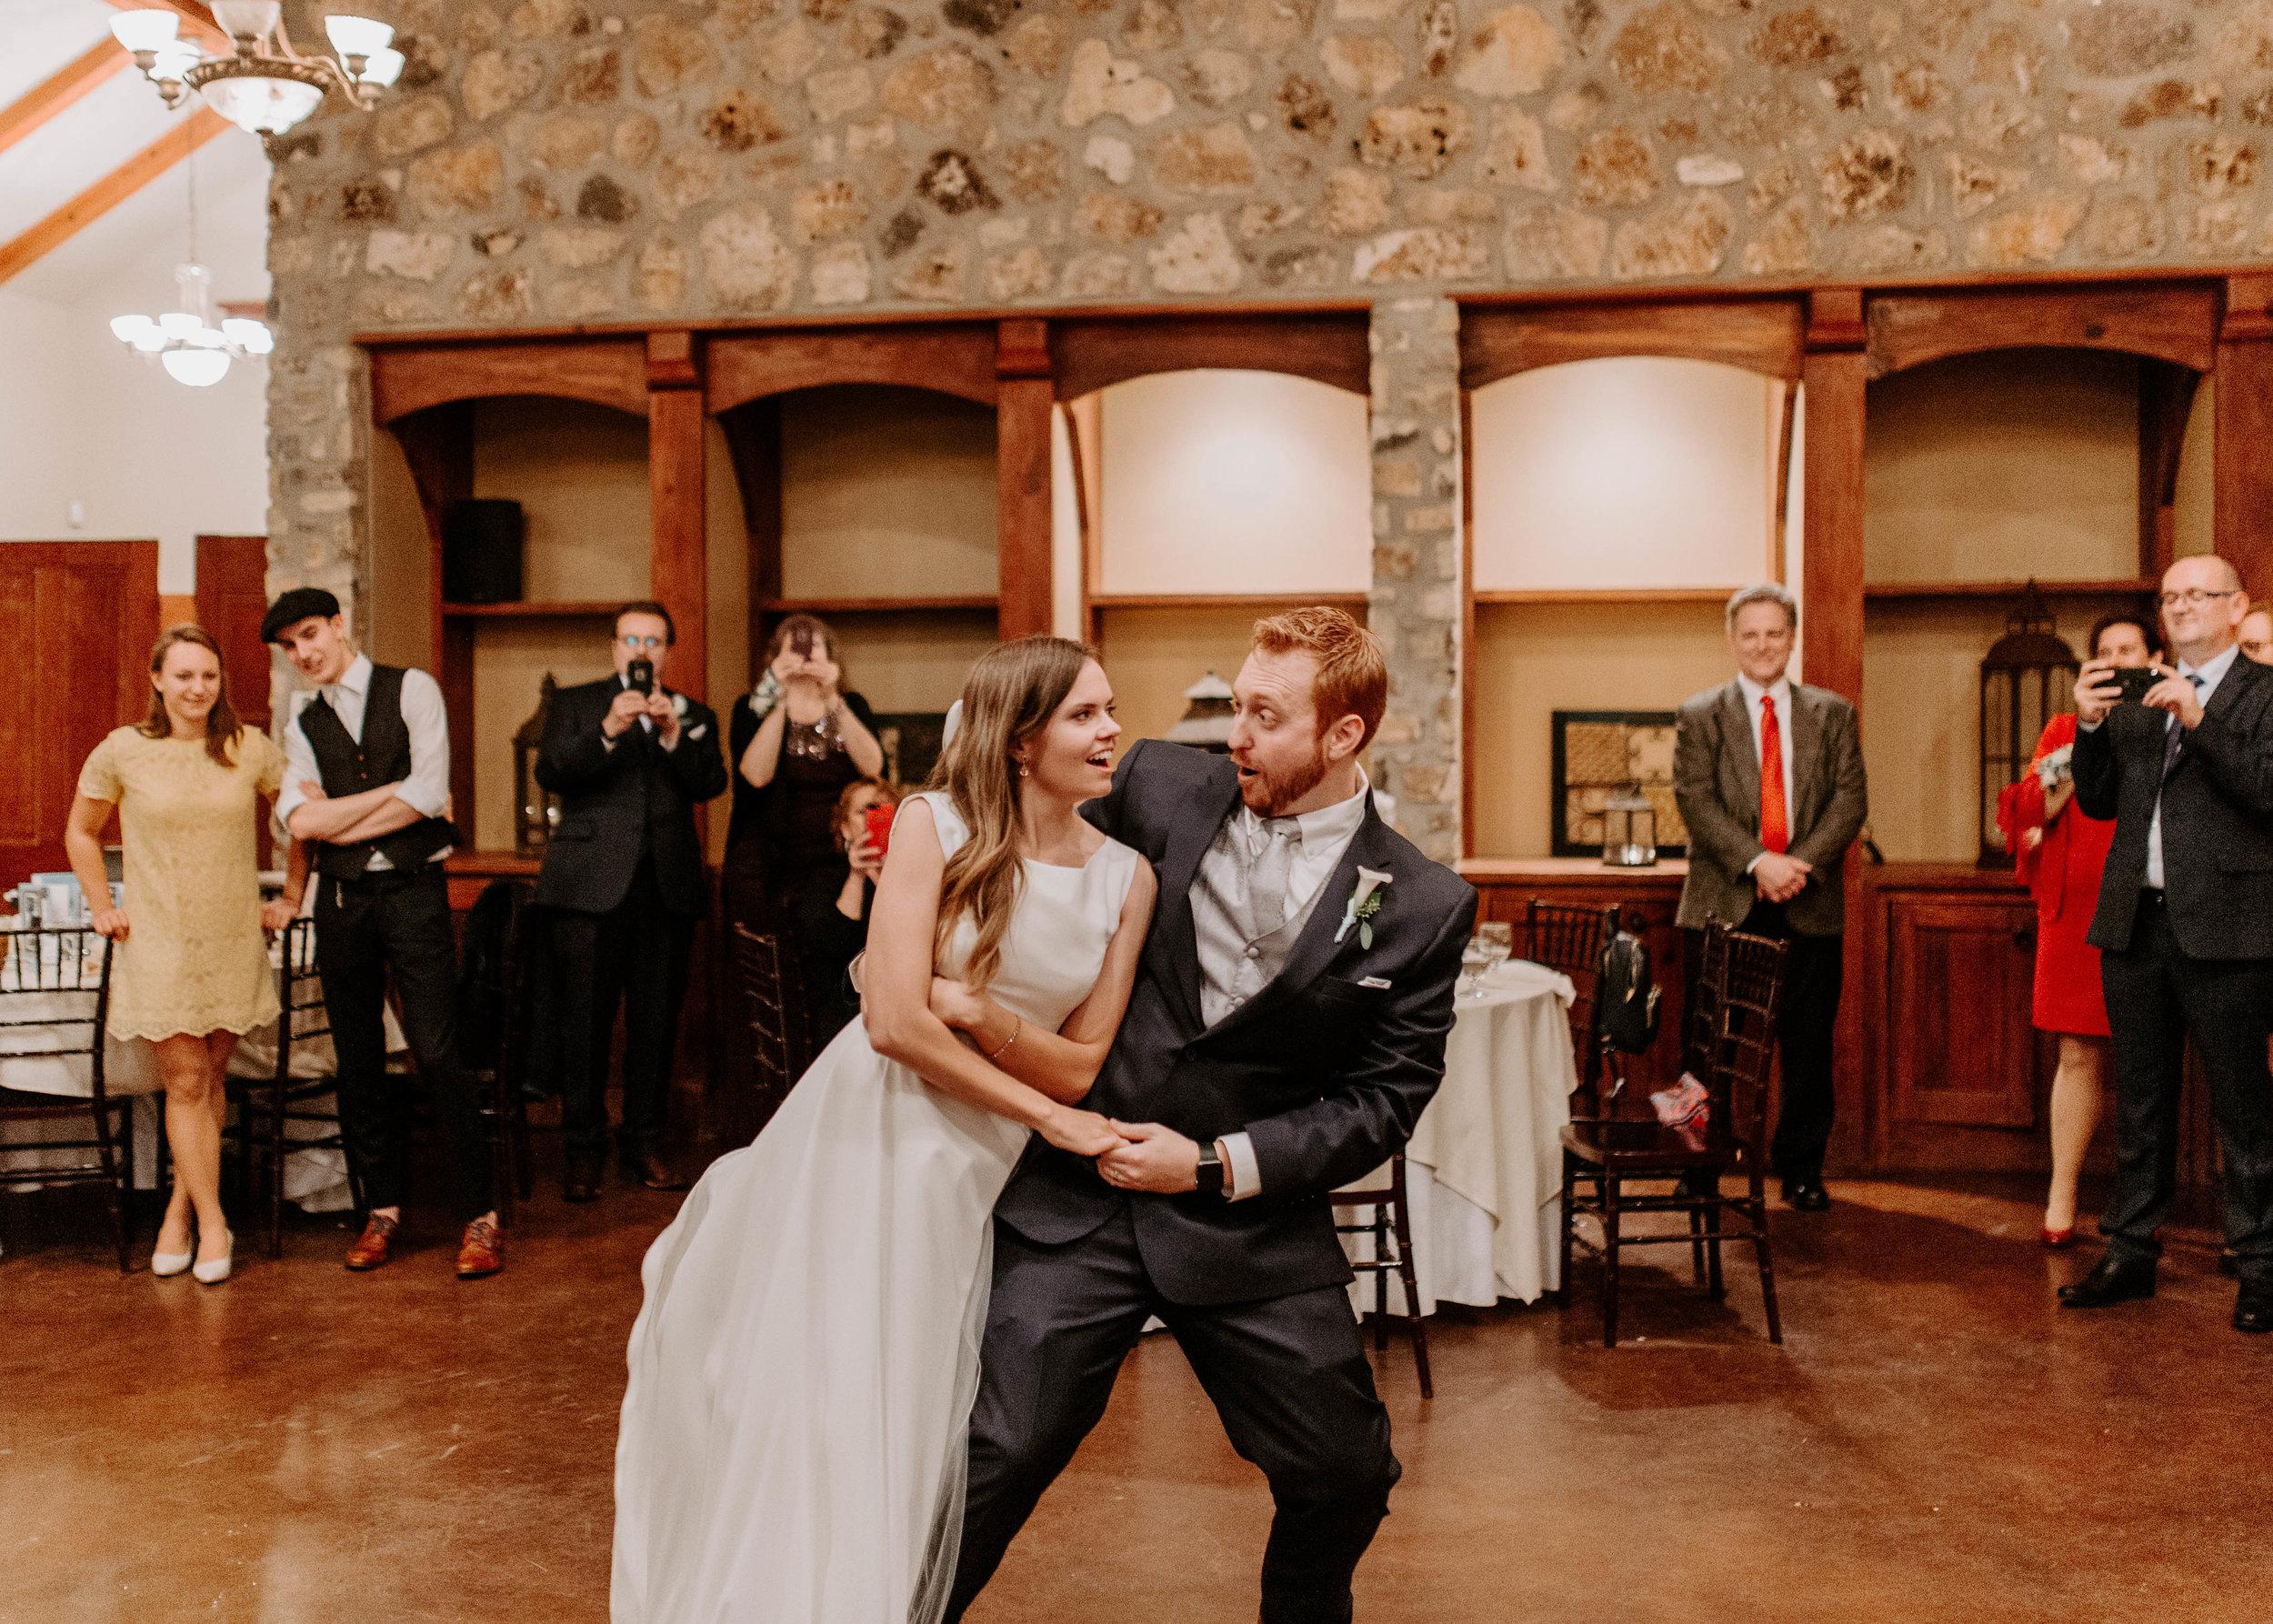 Brad_and_Karoline_Wedding-498.jpg